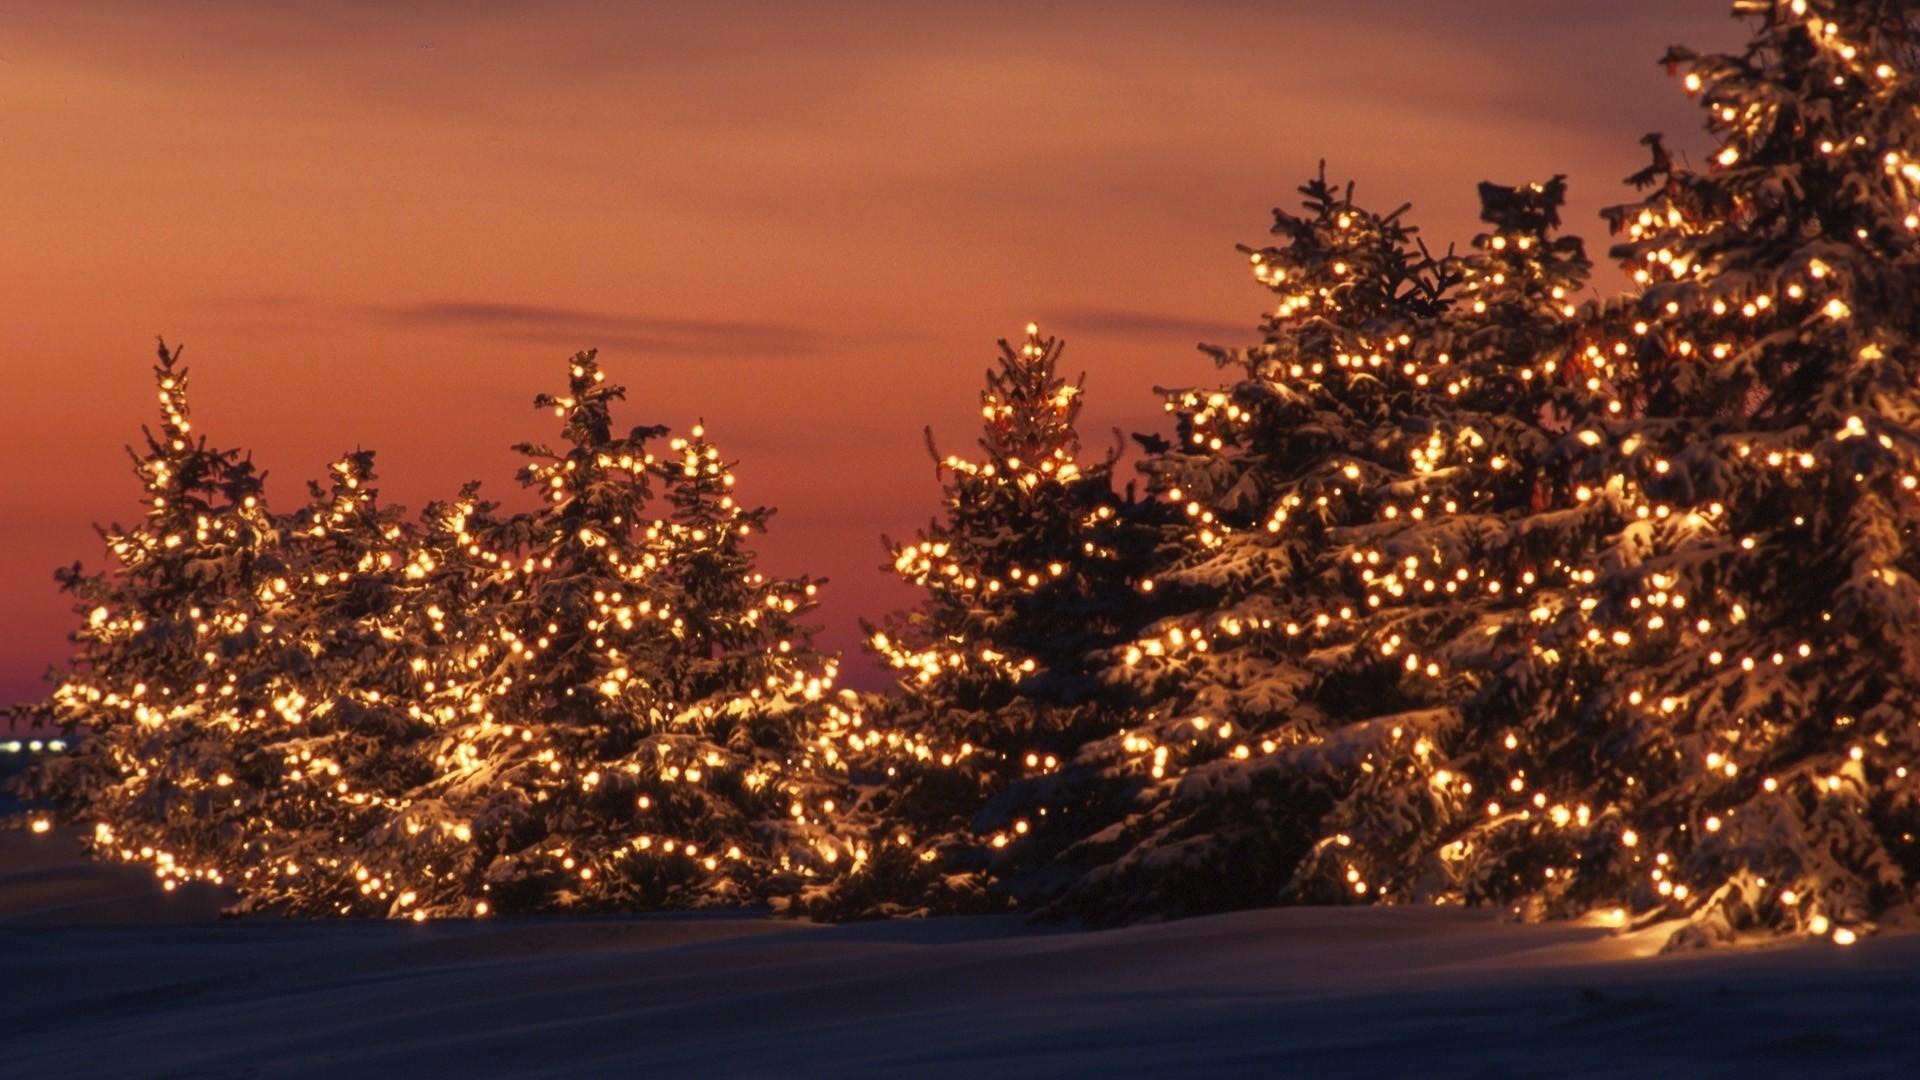 Free Desktop Christmas Lights Wallpapers Winter.